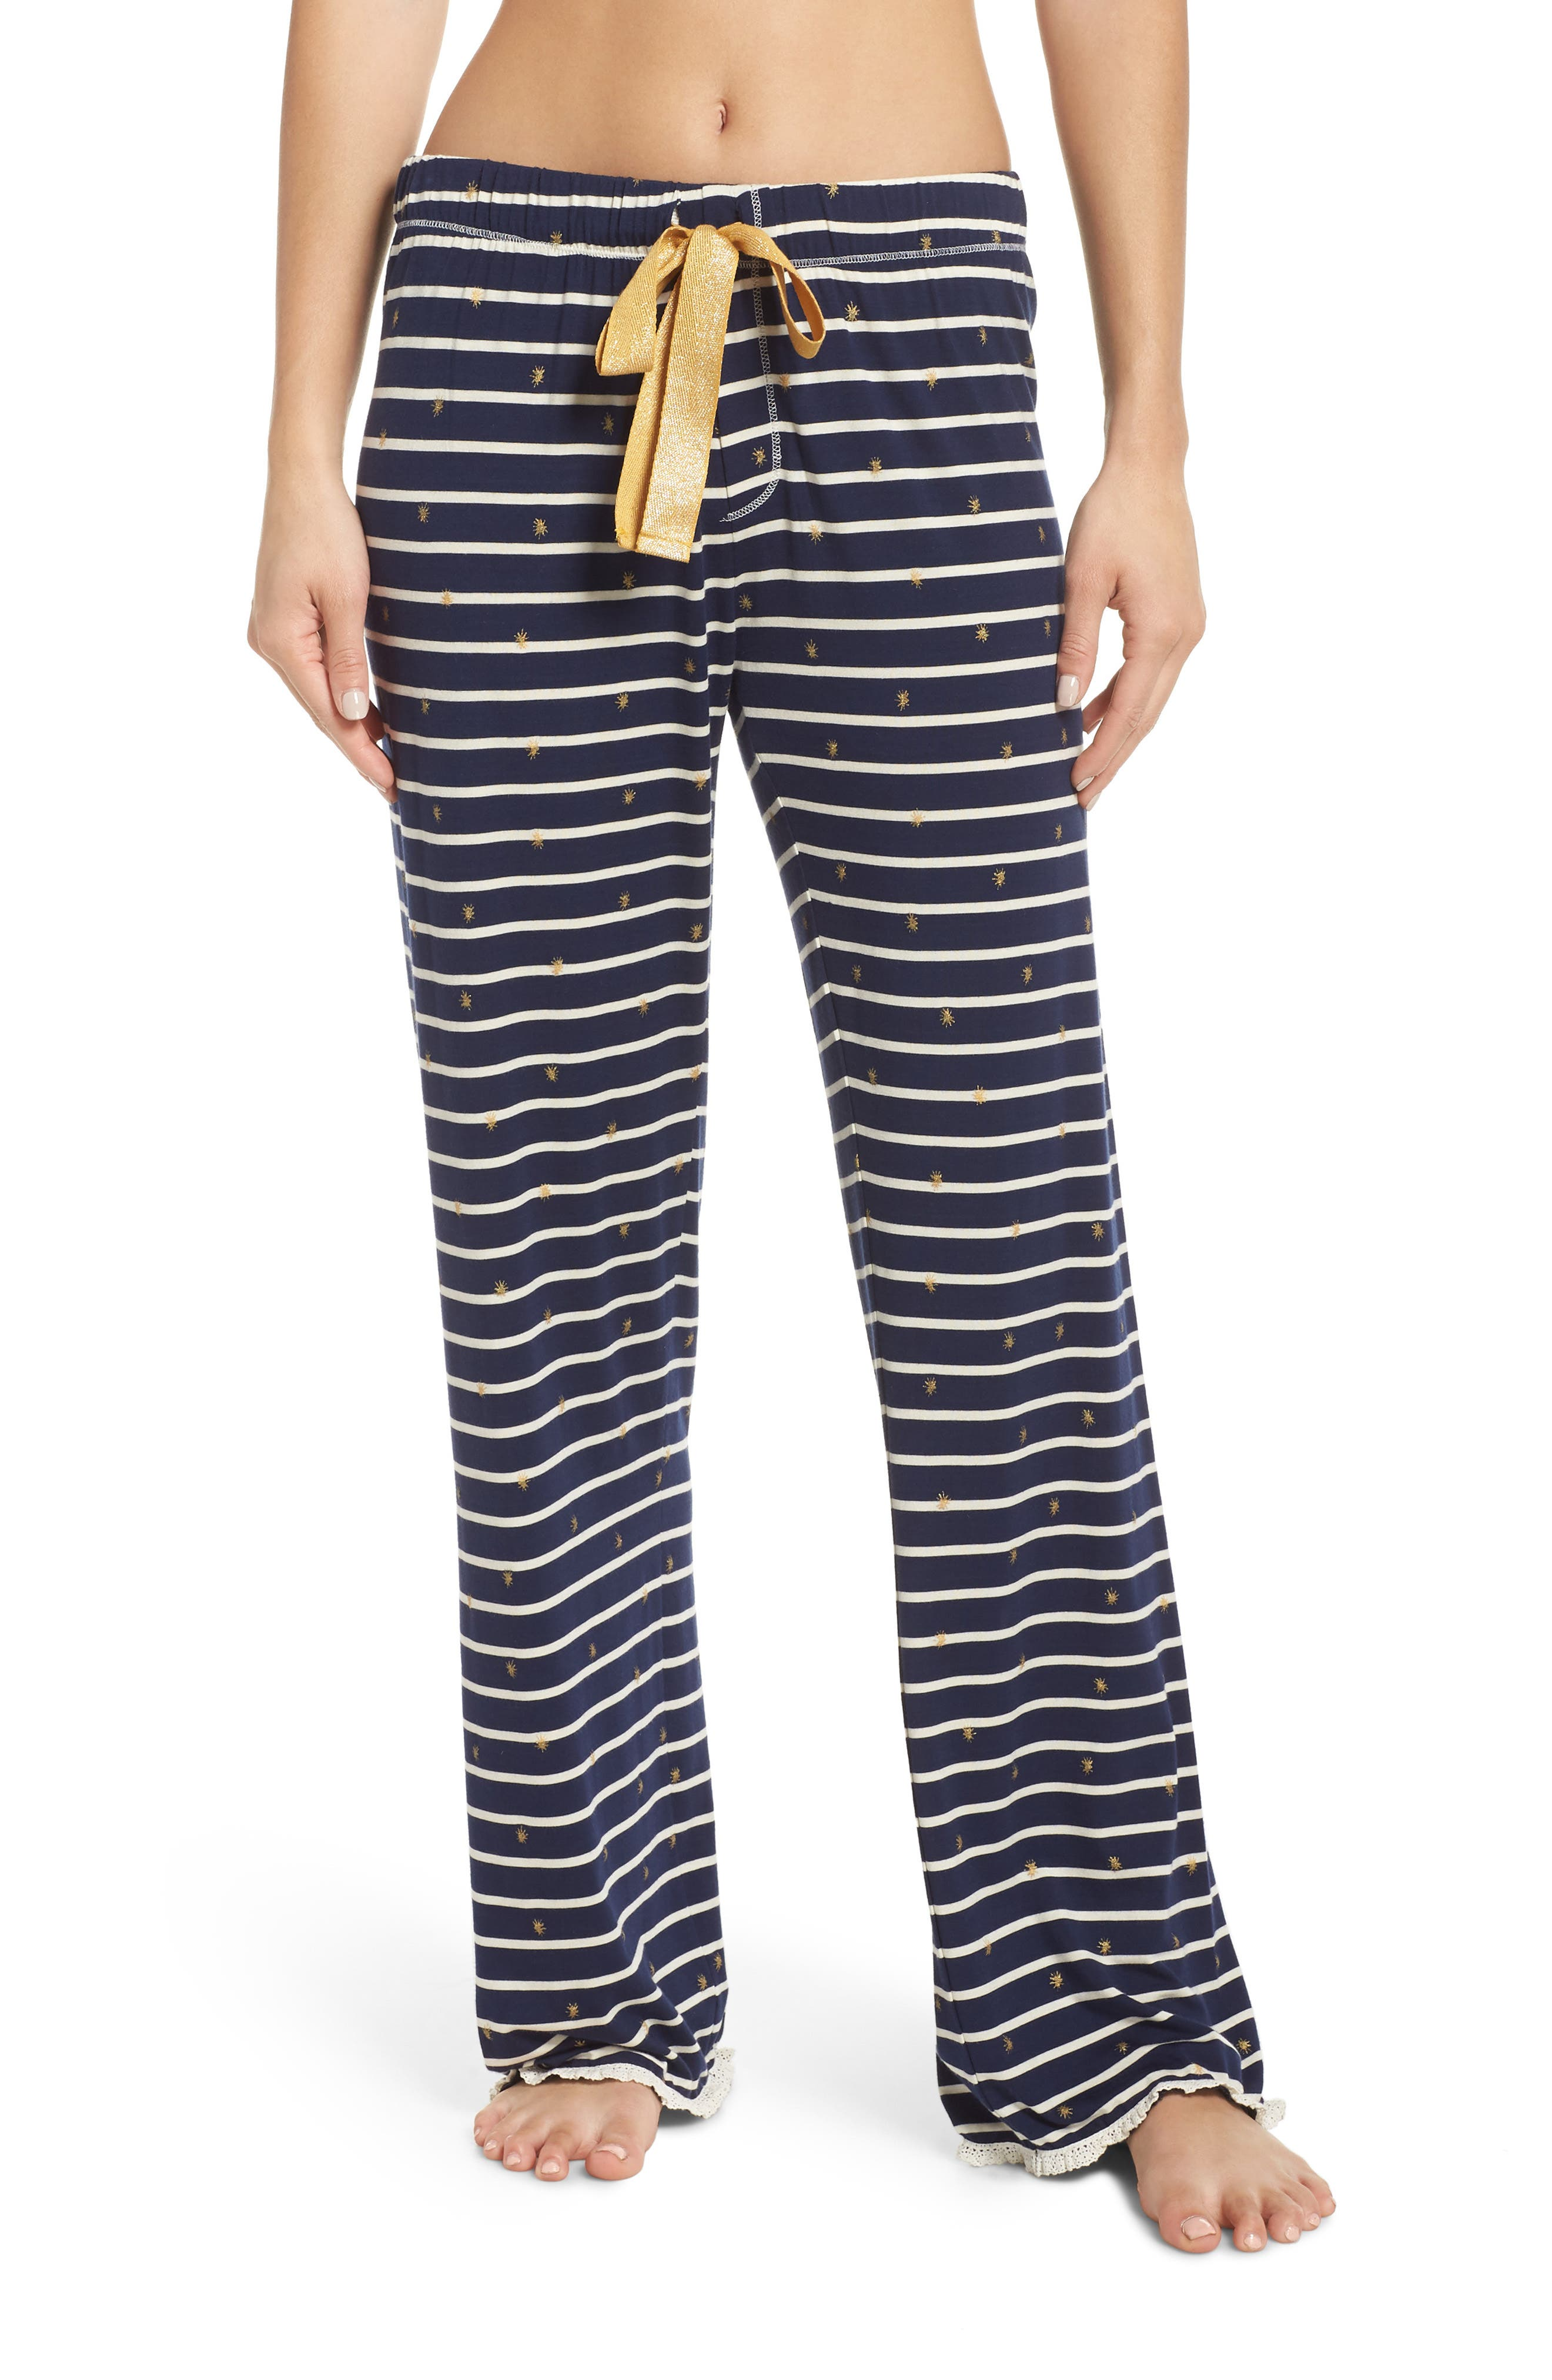 HATLEY, Cozy Pajama Pants, Main thumbnail 1, color, BLUE